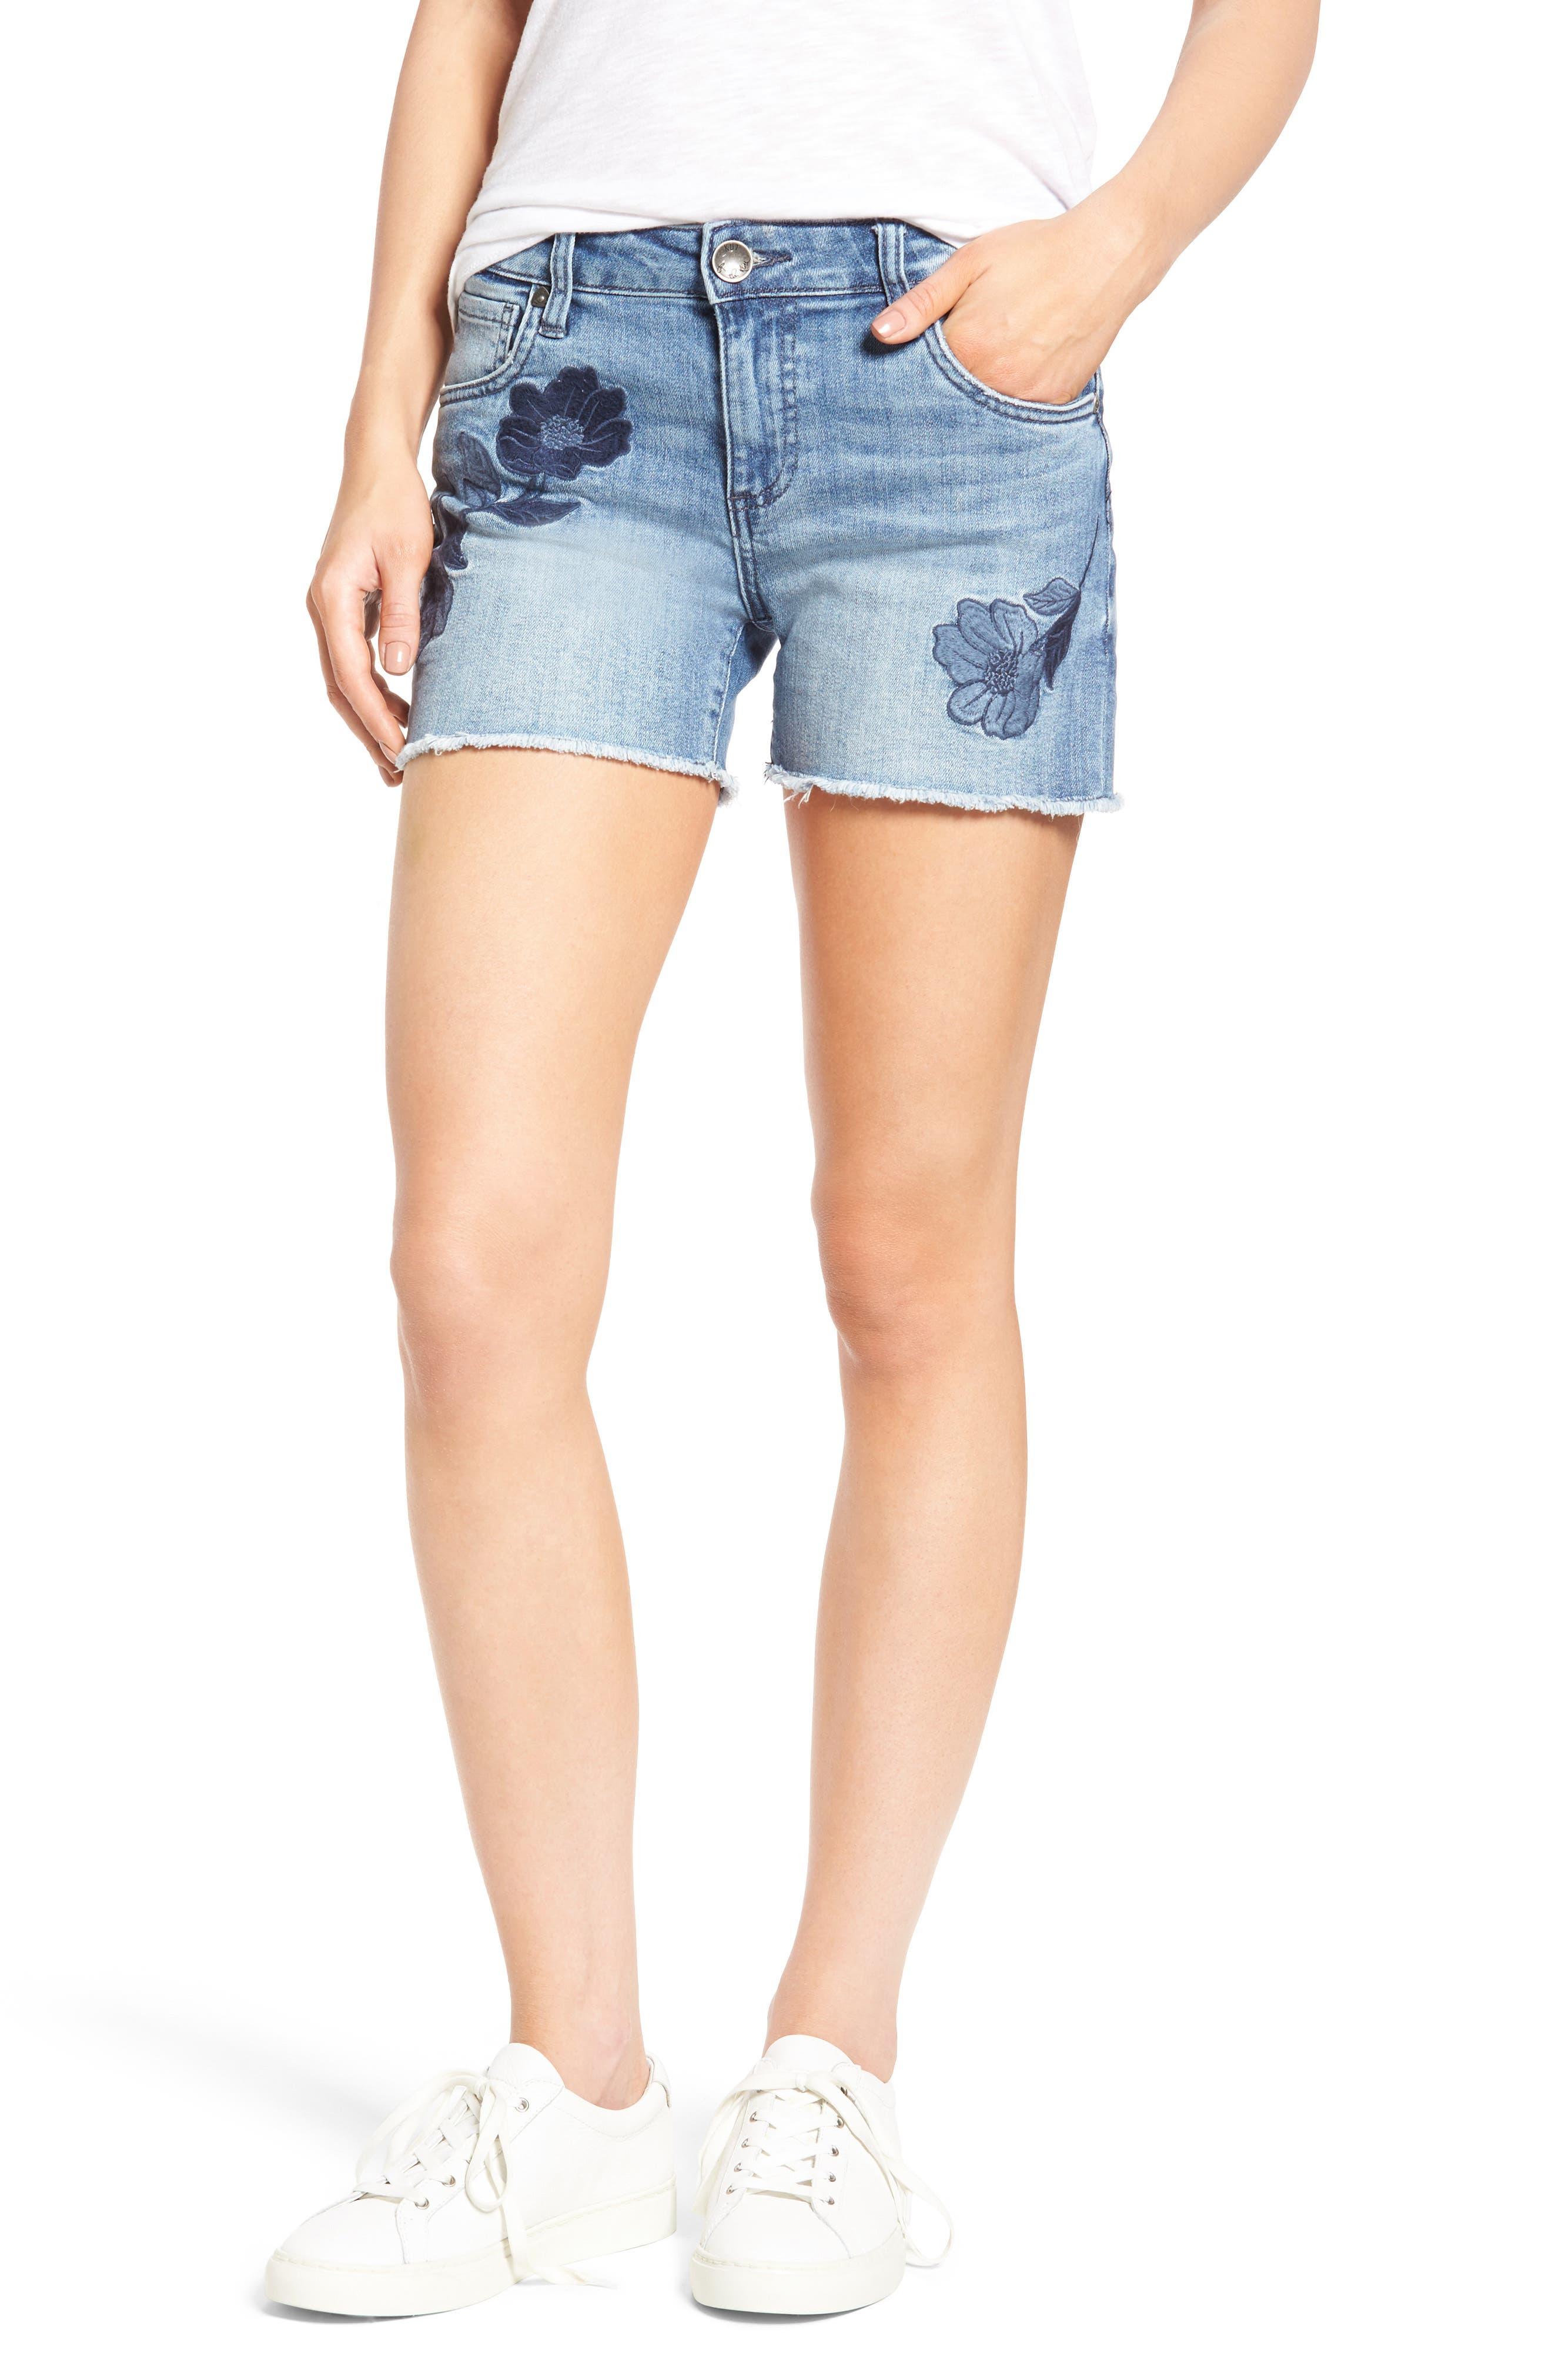 KUT from the Kloth Gidget Embroidered Denim Cutoff Shorts